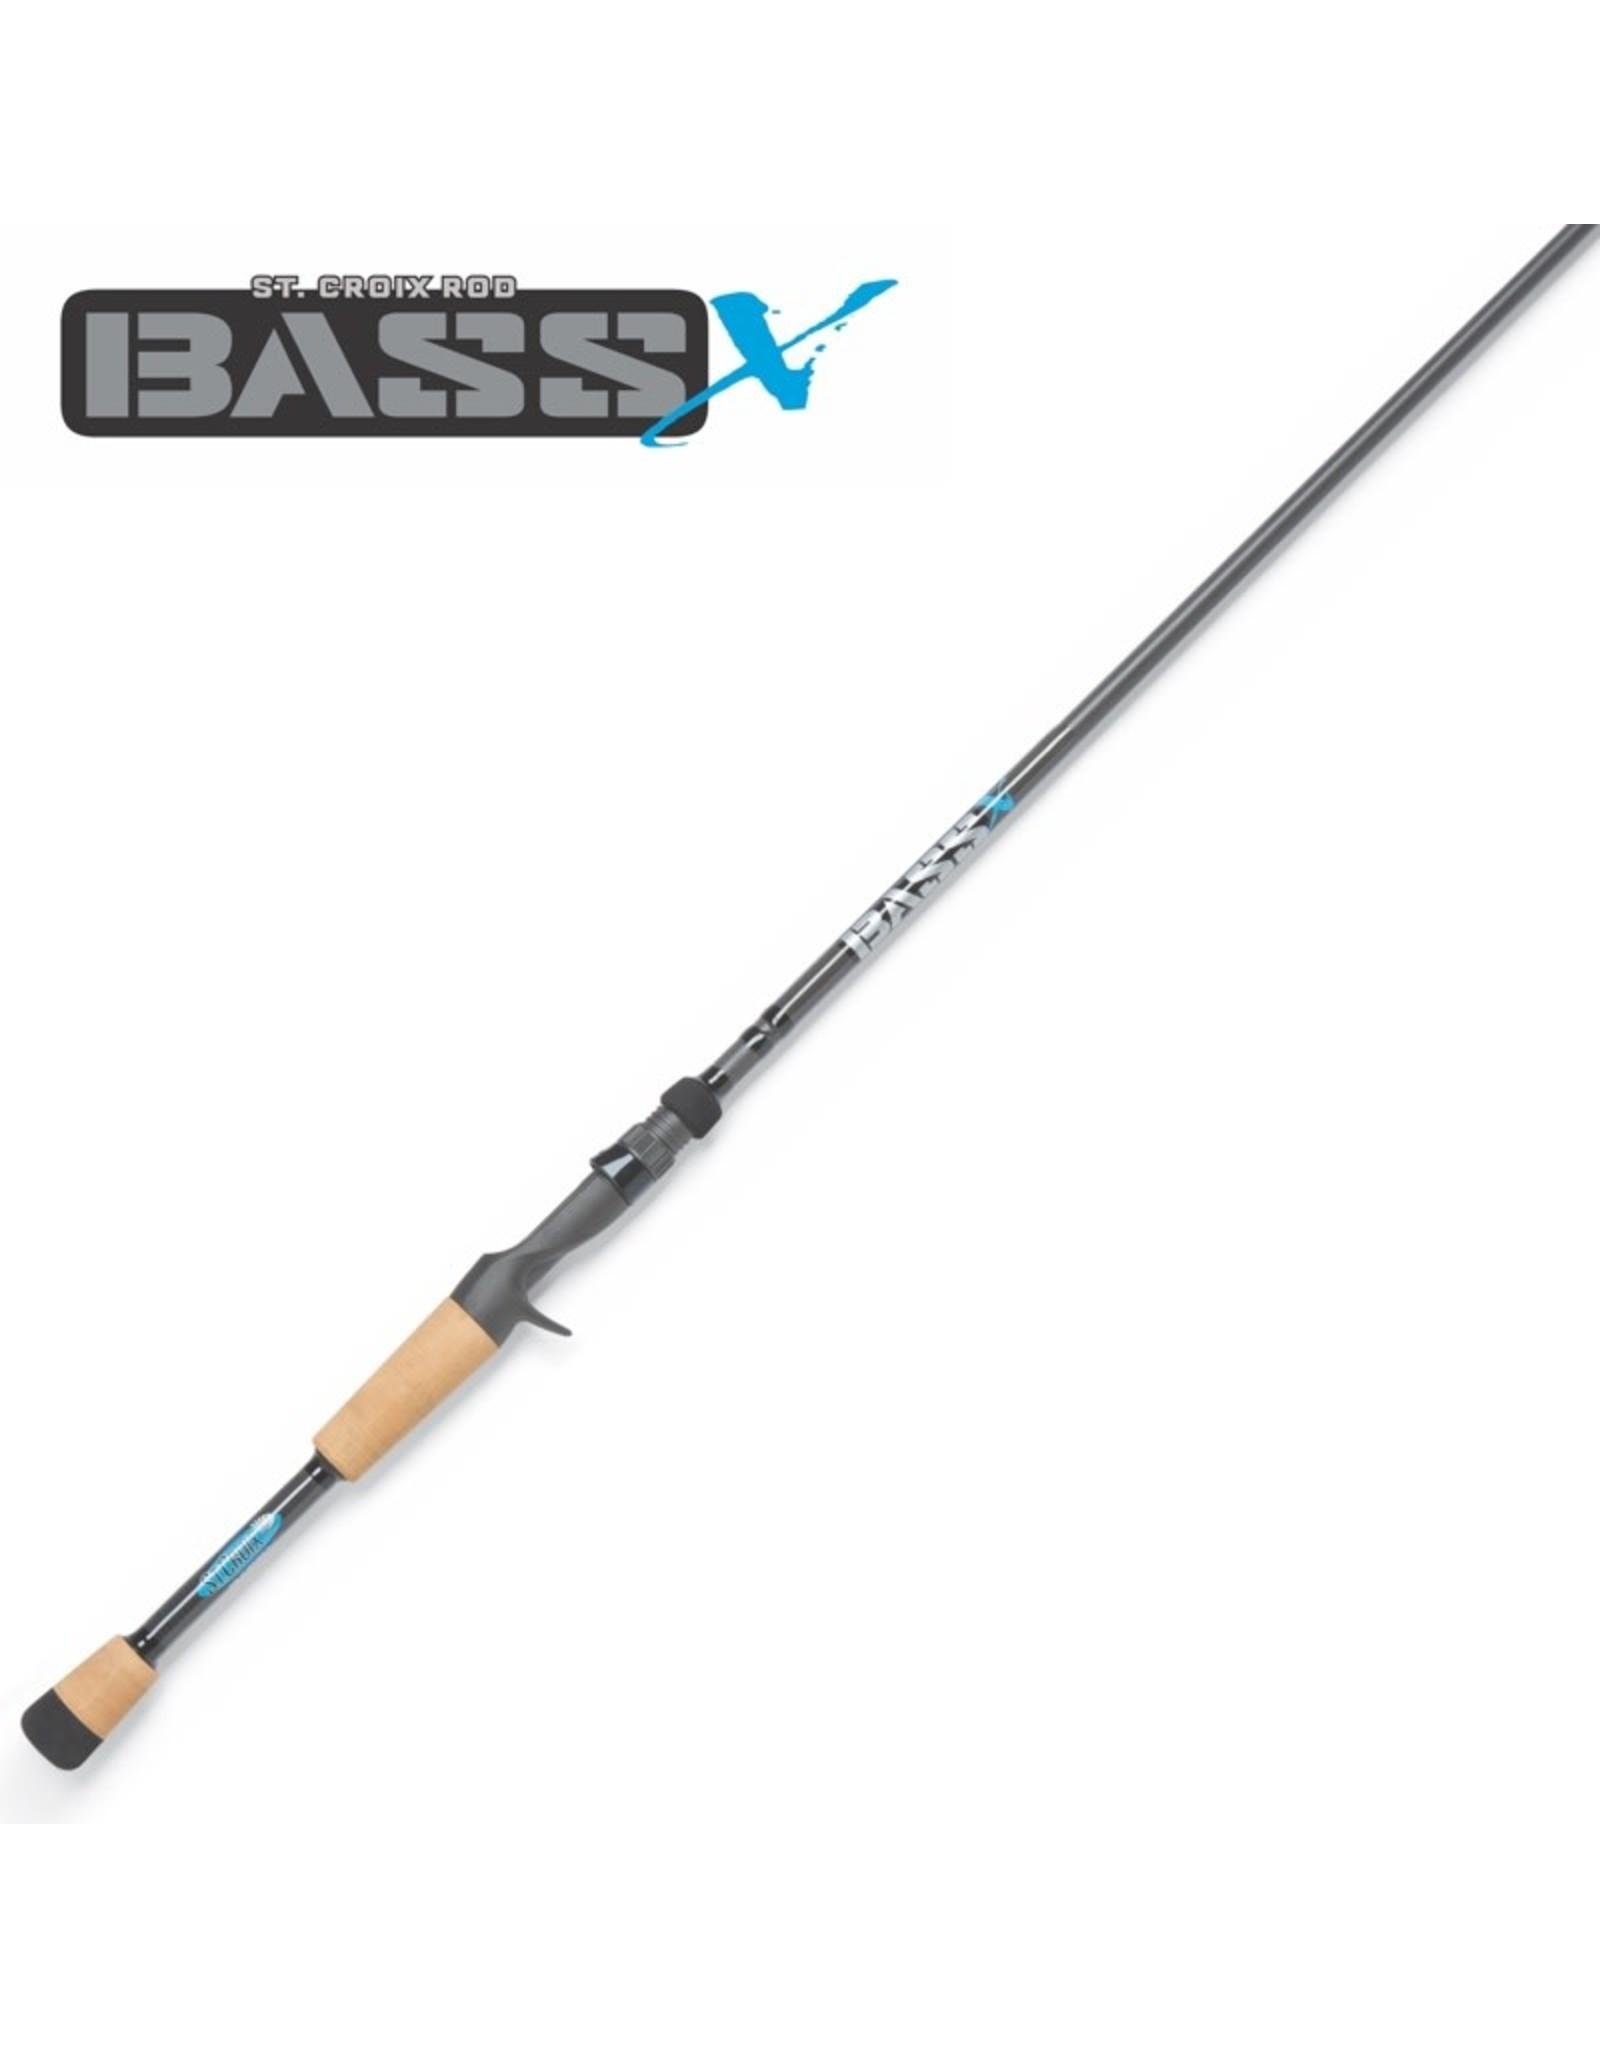 St. Croix Bass X Casting 7'1 MHF